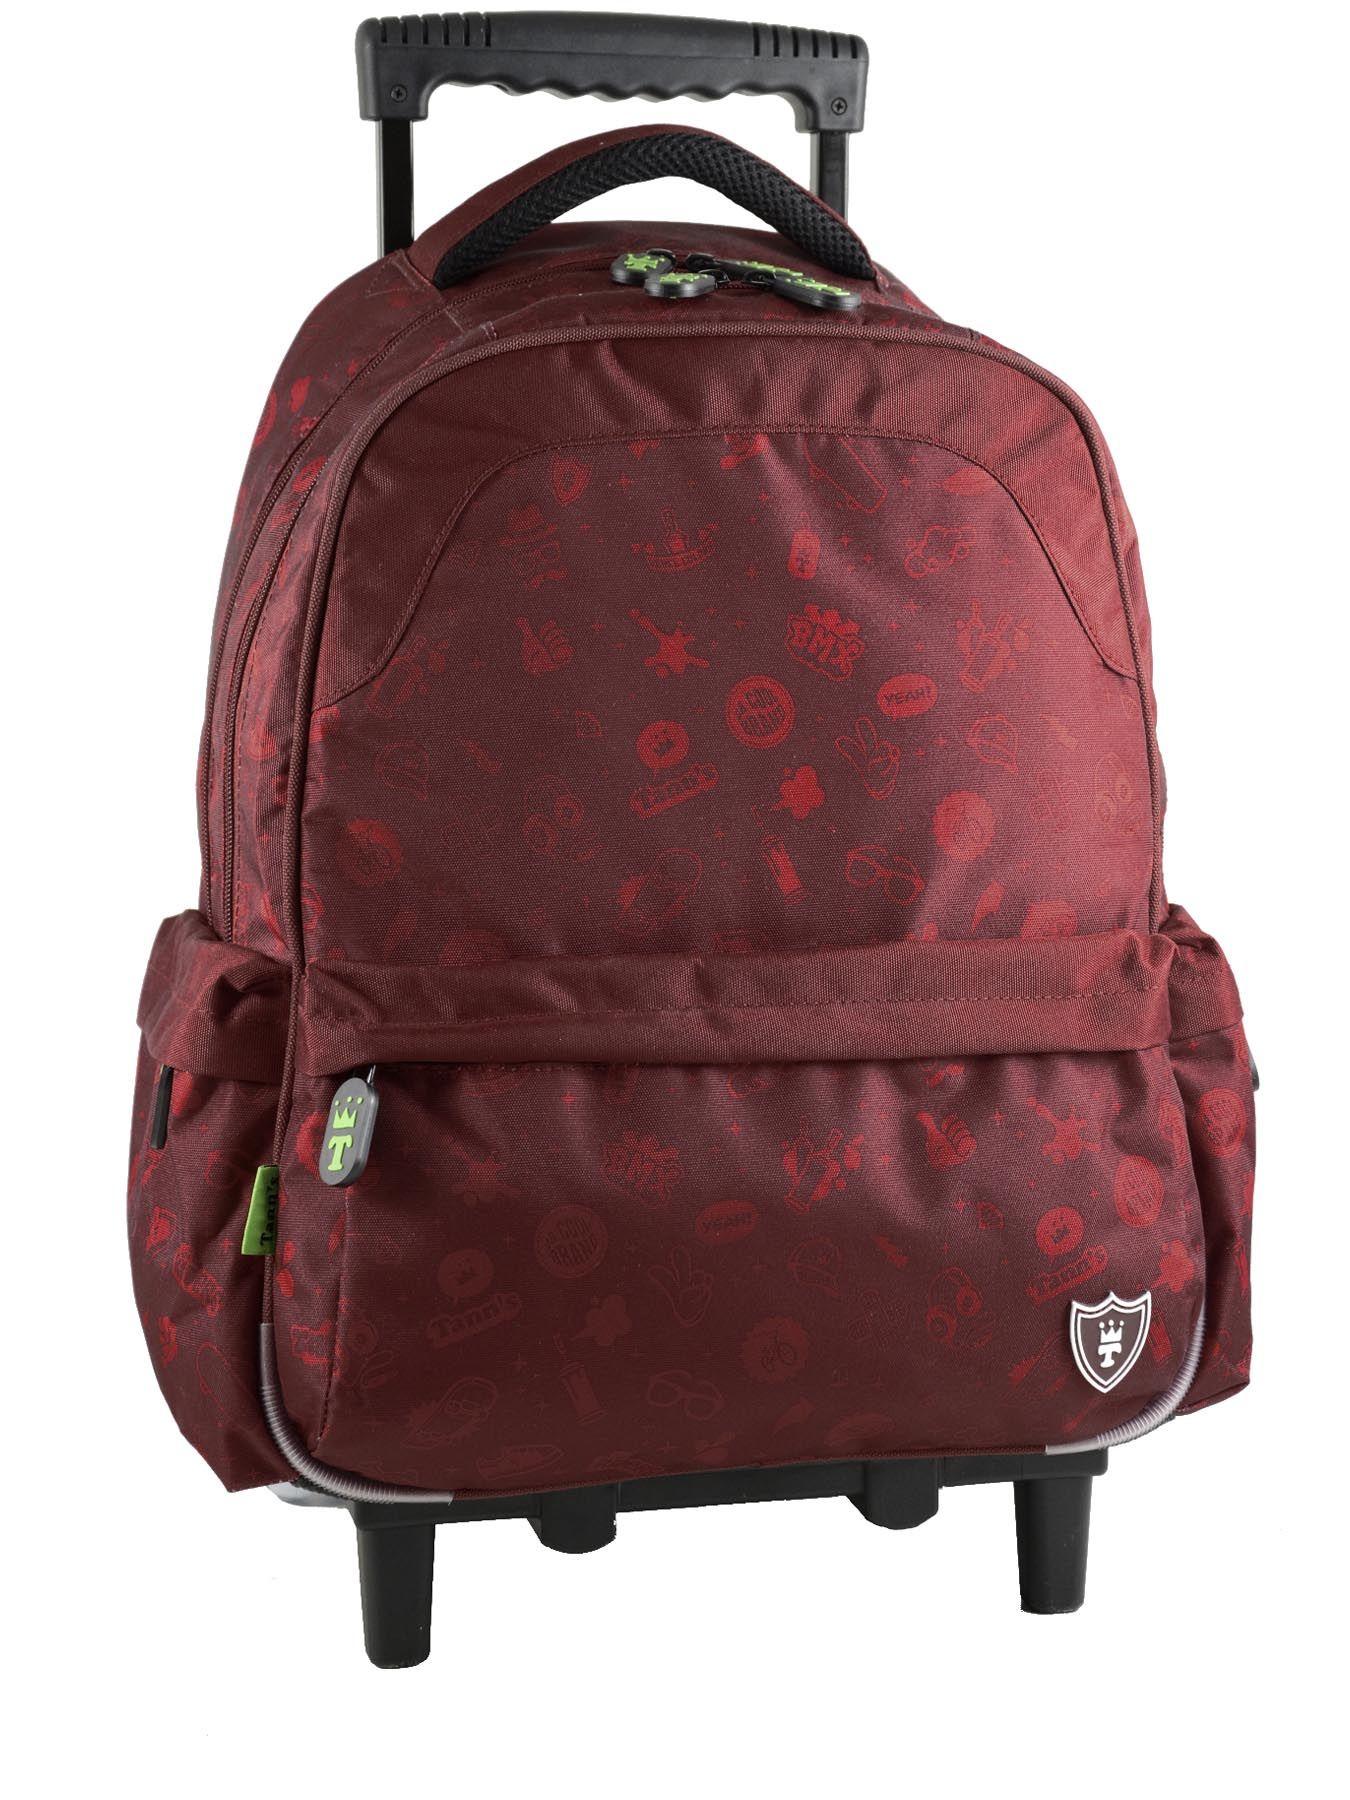 sac a dos a roulettes tann 39 s rouge fun boy l3trsadl. Black Bedroom Furniture Sets. Home Design Ideas